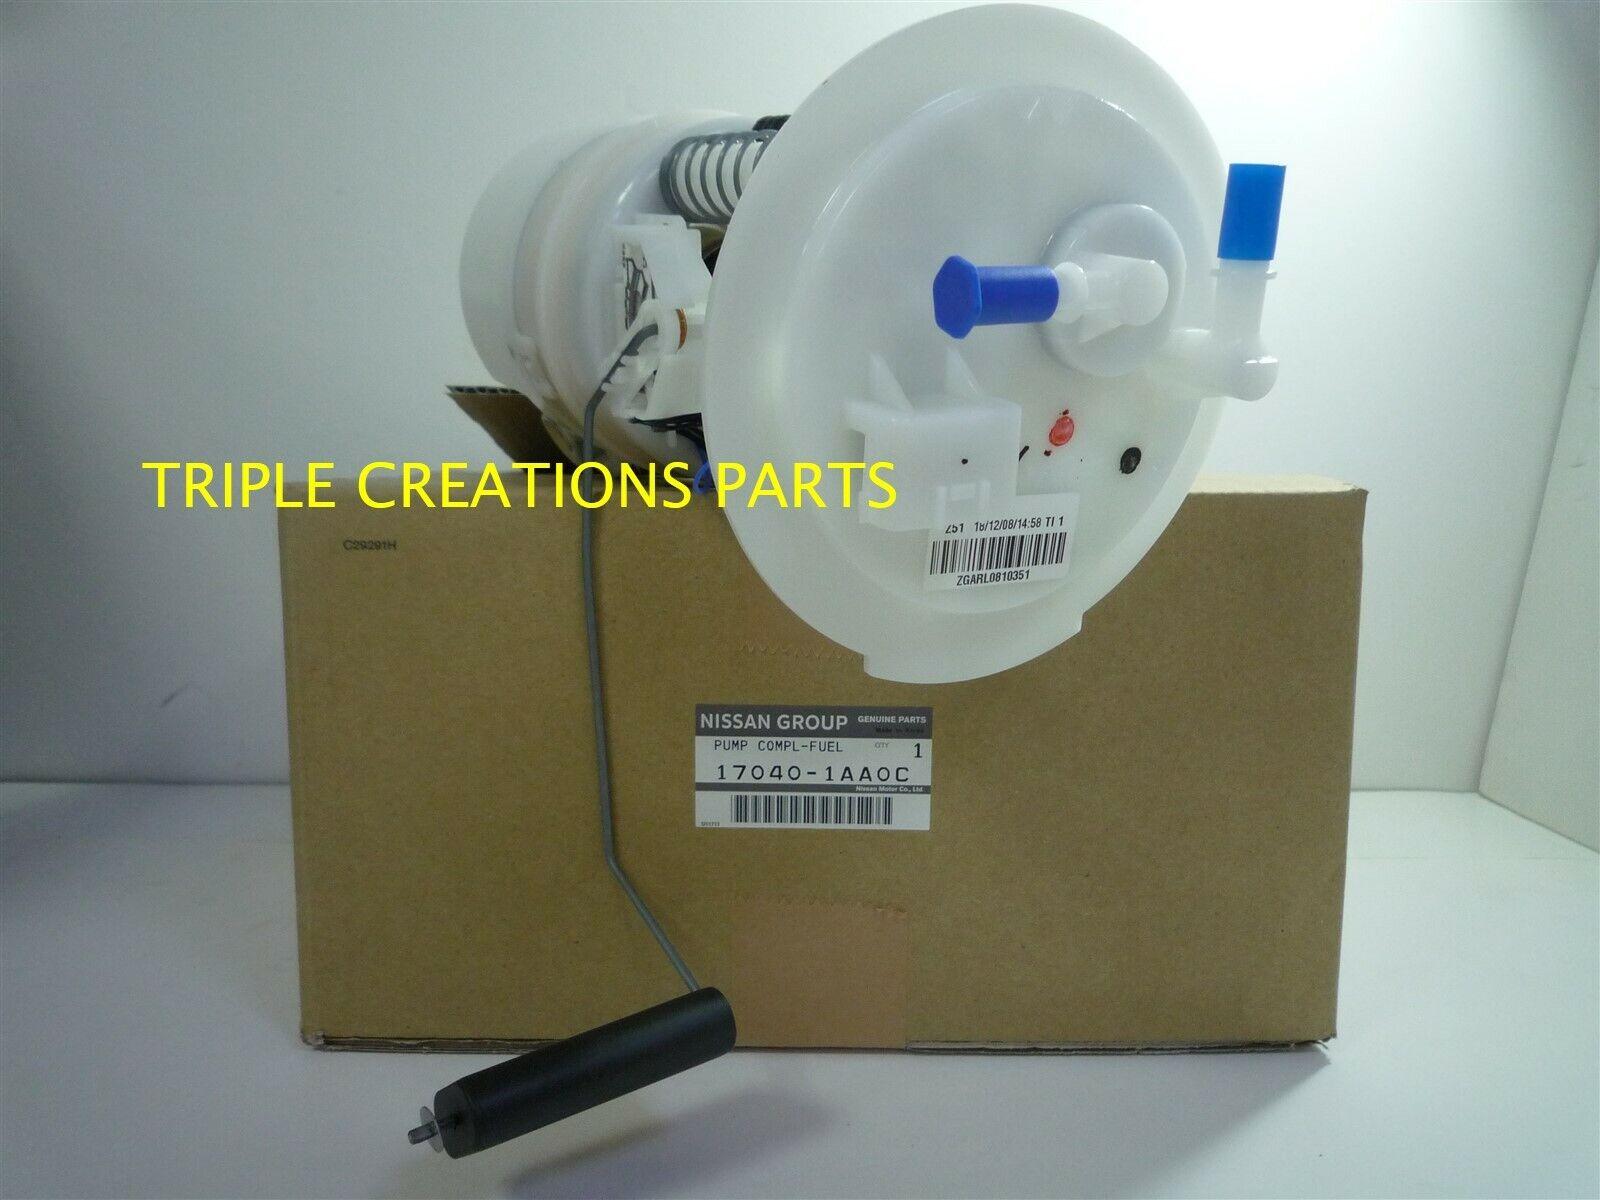 170401AA0C Genuine Nissan PUMP COMPL-FUEL 17040-1AA0C